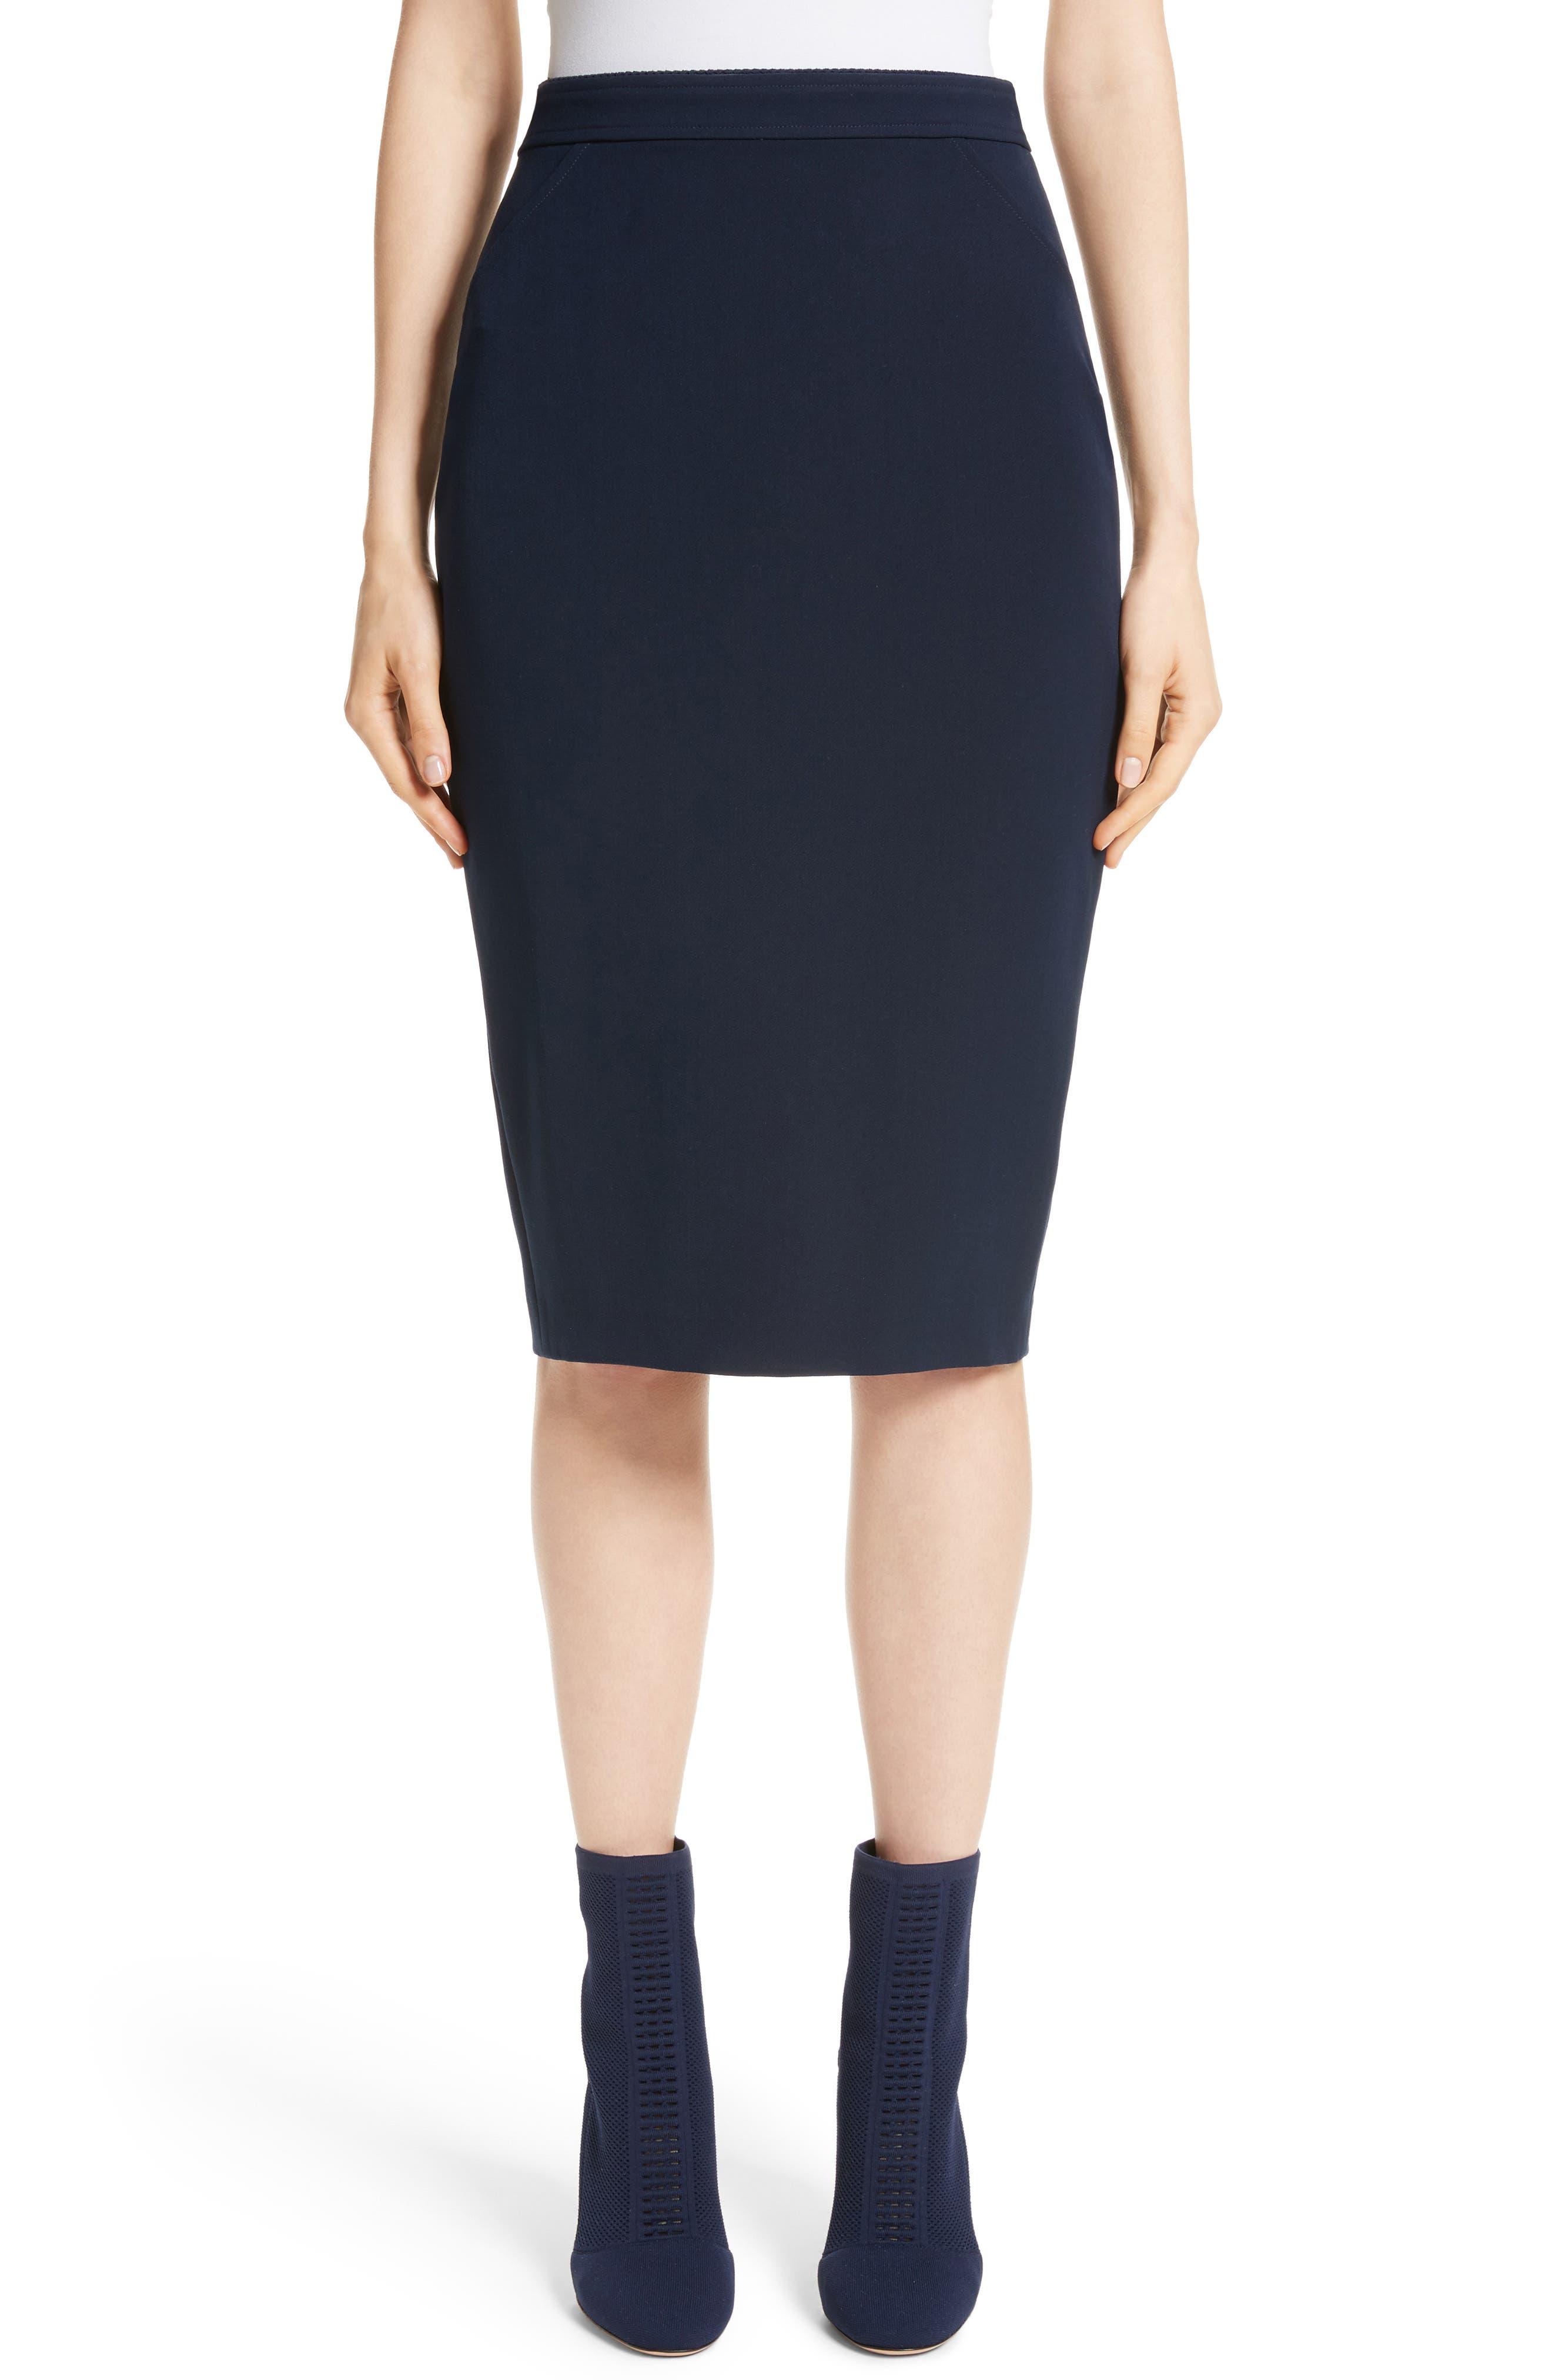 Bella Double Weave Pencil Skirt,                         Main,                         color, Navy